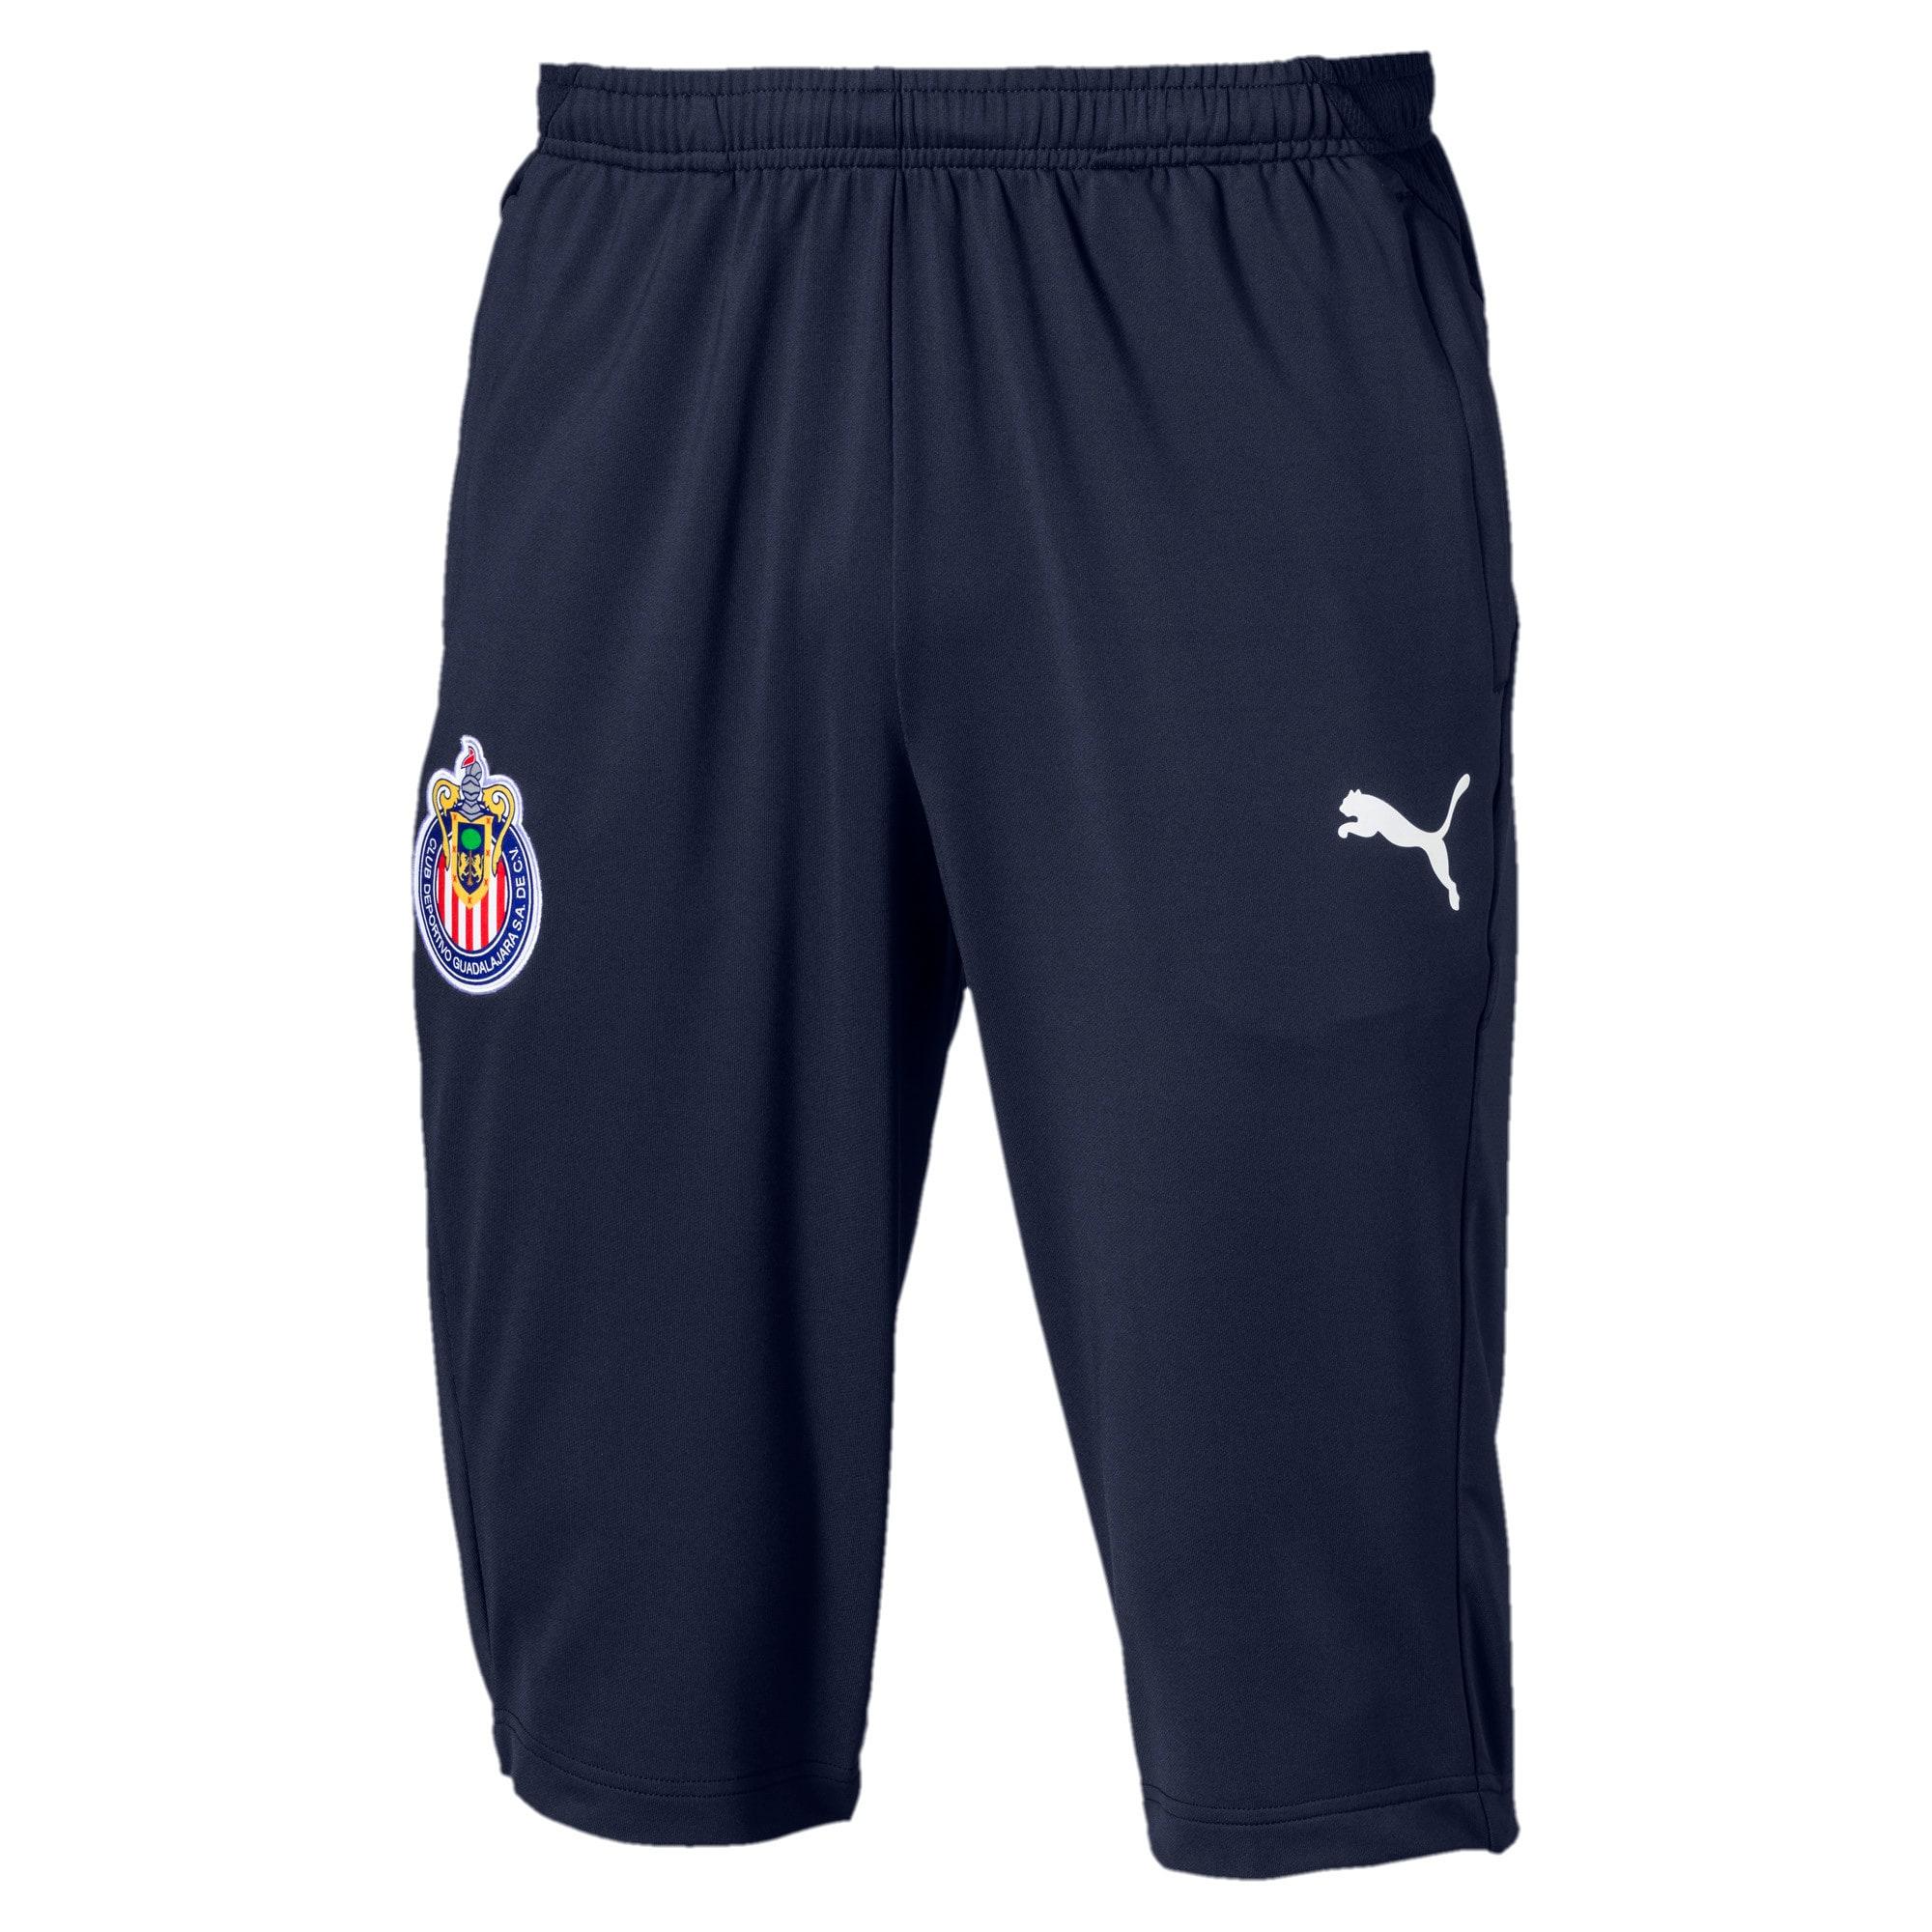 Thumbnail 1 of Chivas Men's 3/4 Training Pants, Peacoat, medium